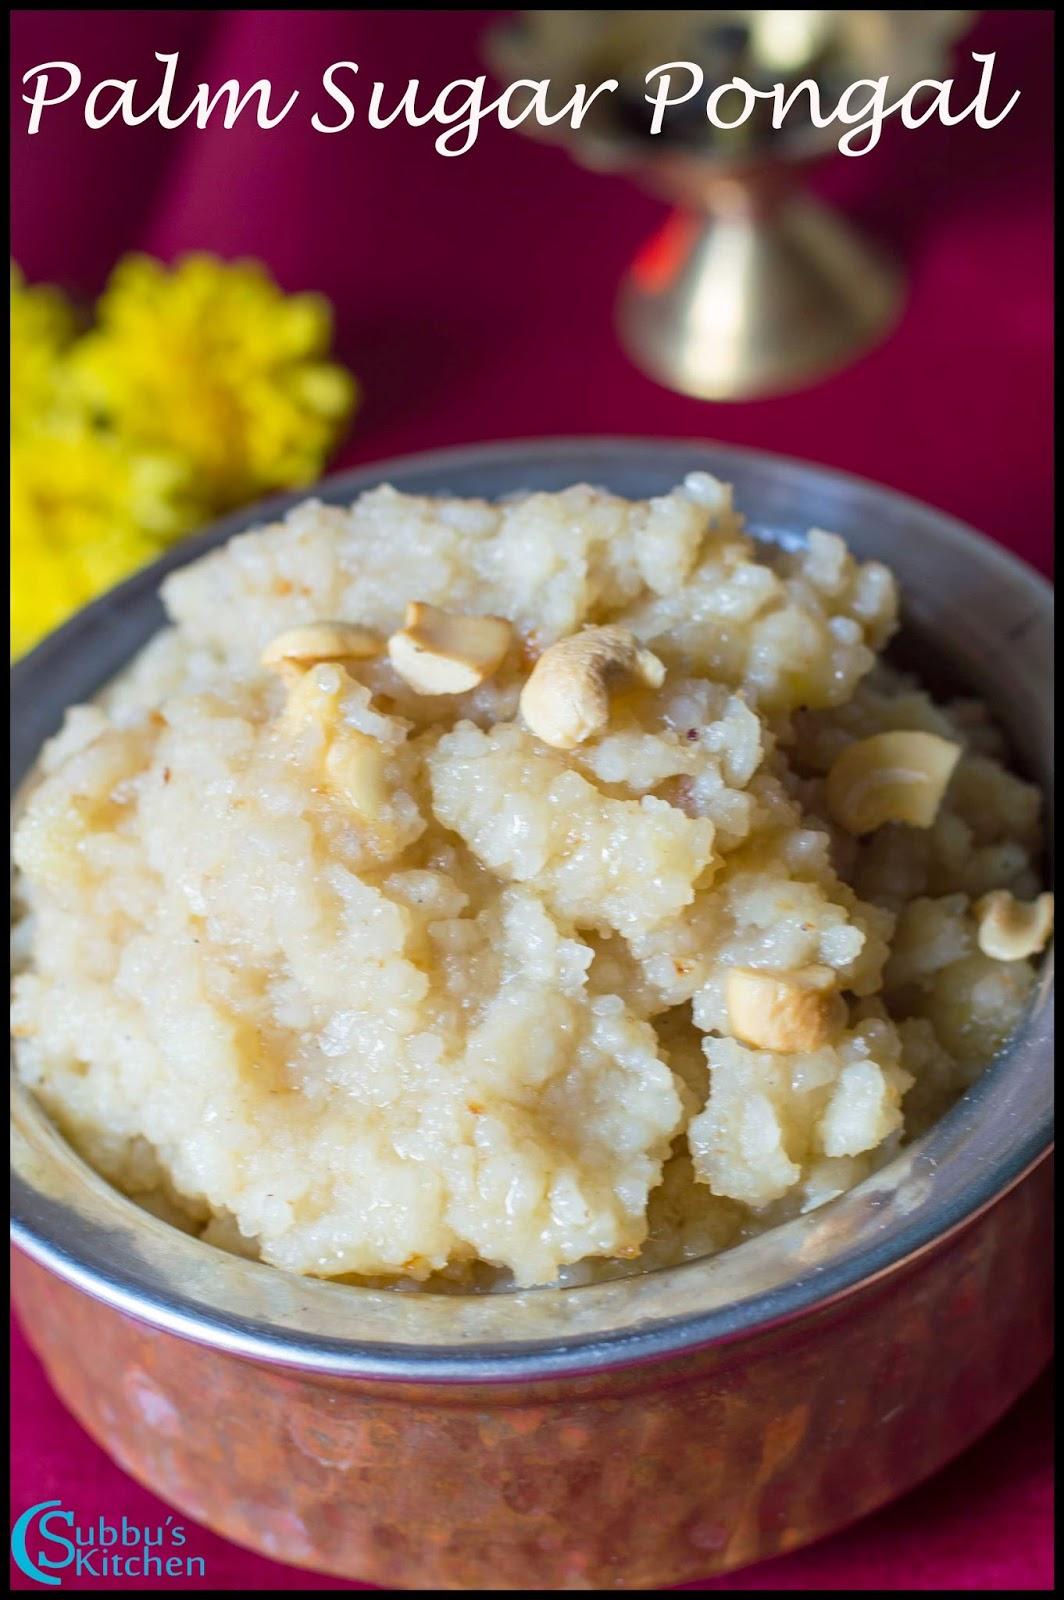 Panam Kalkandu Pongal recipe | Palm Sugar Pongal Recipe